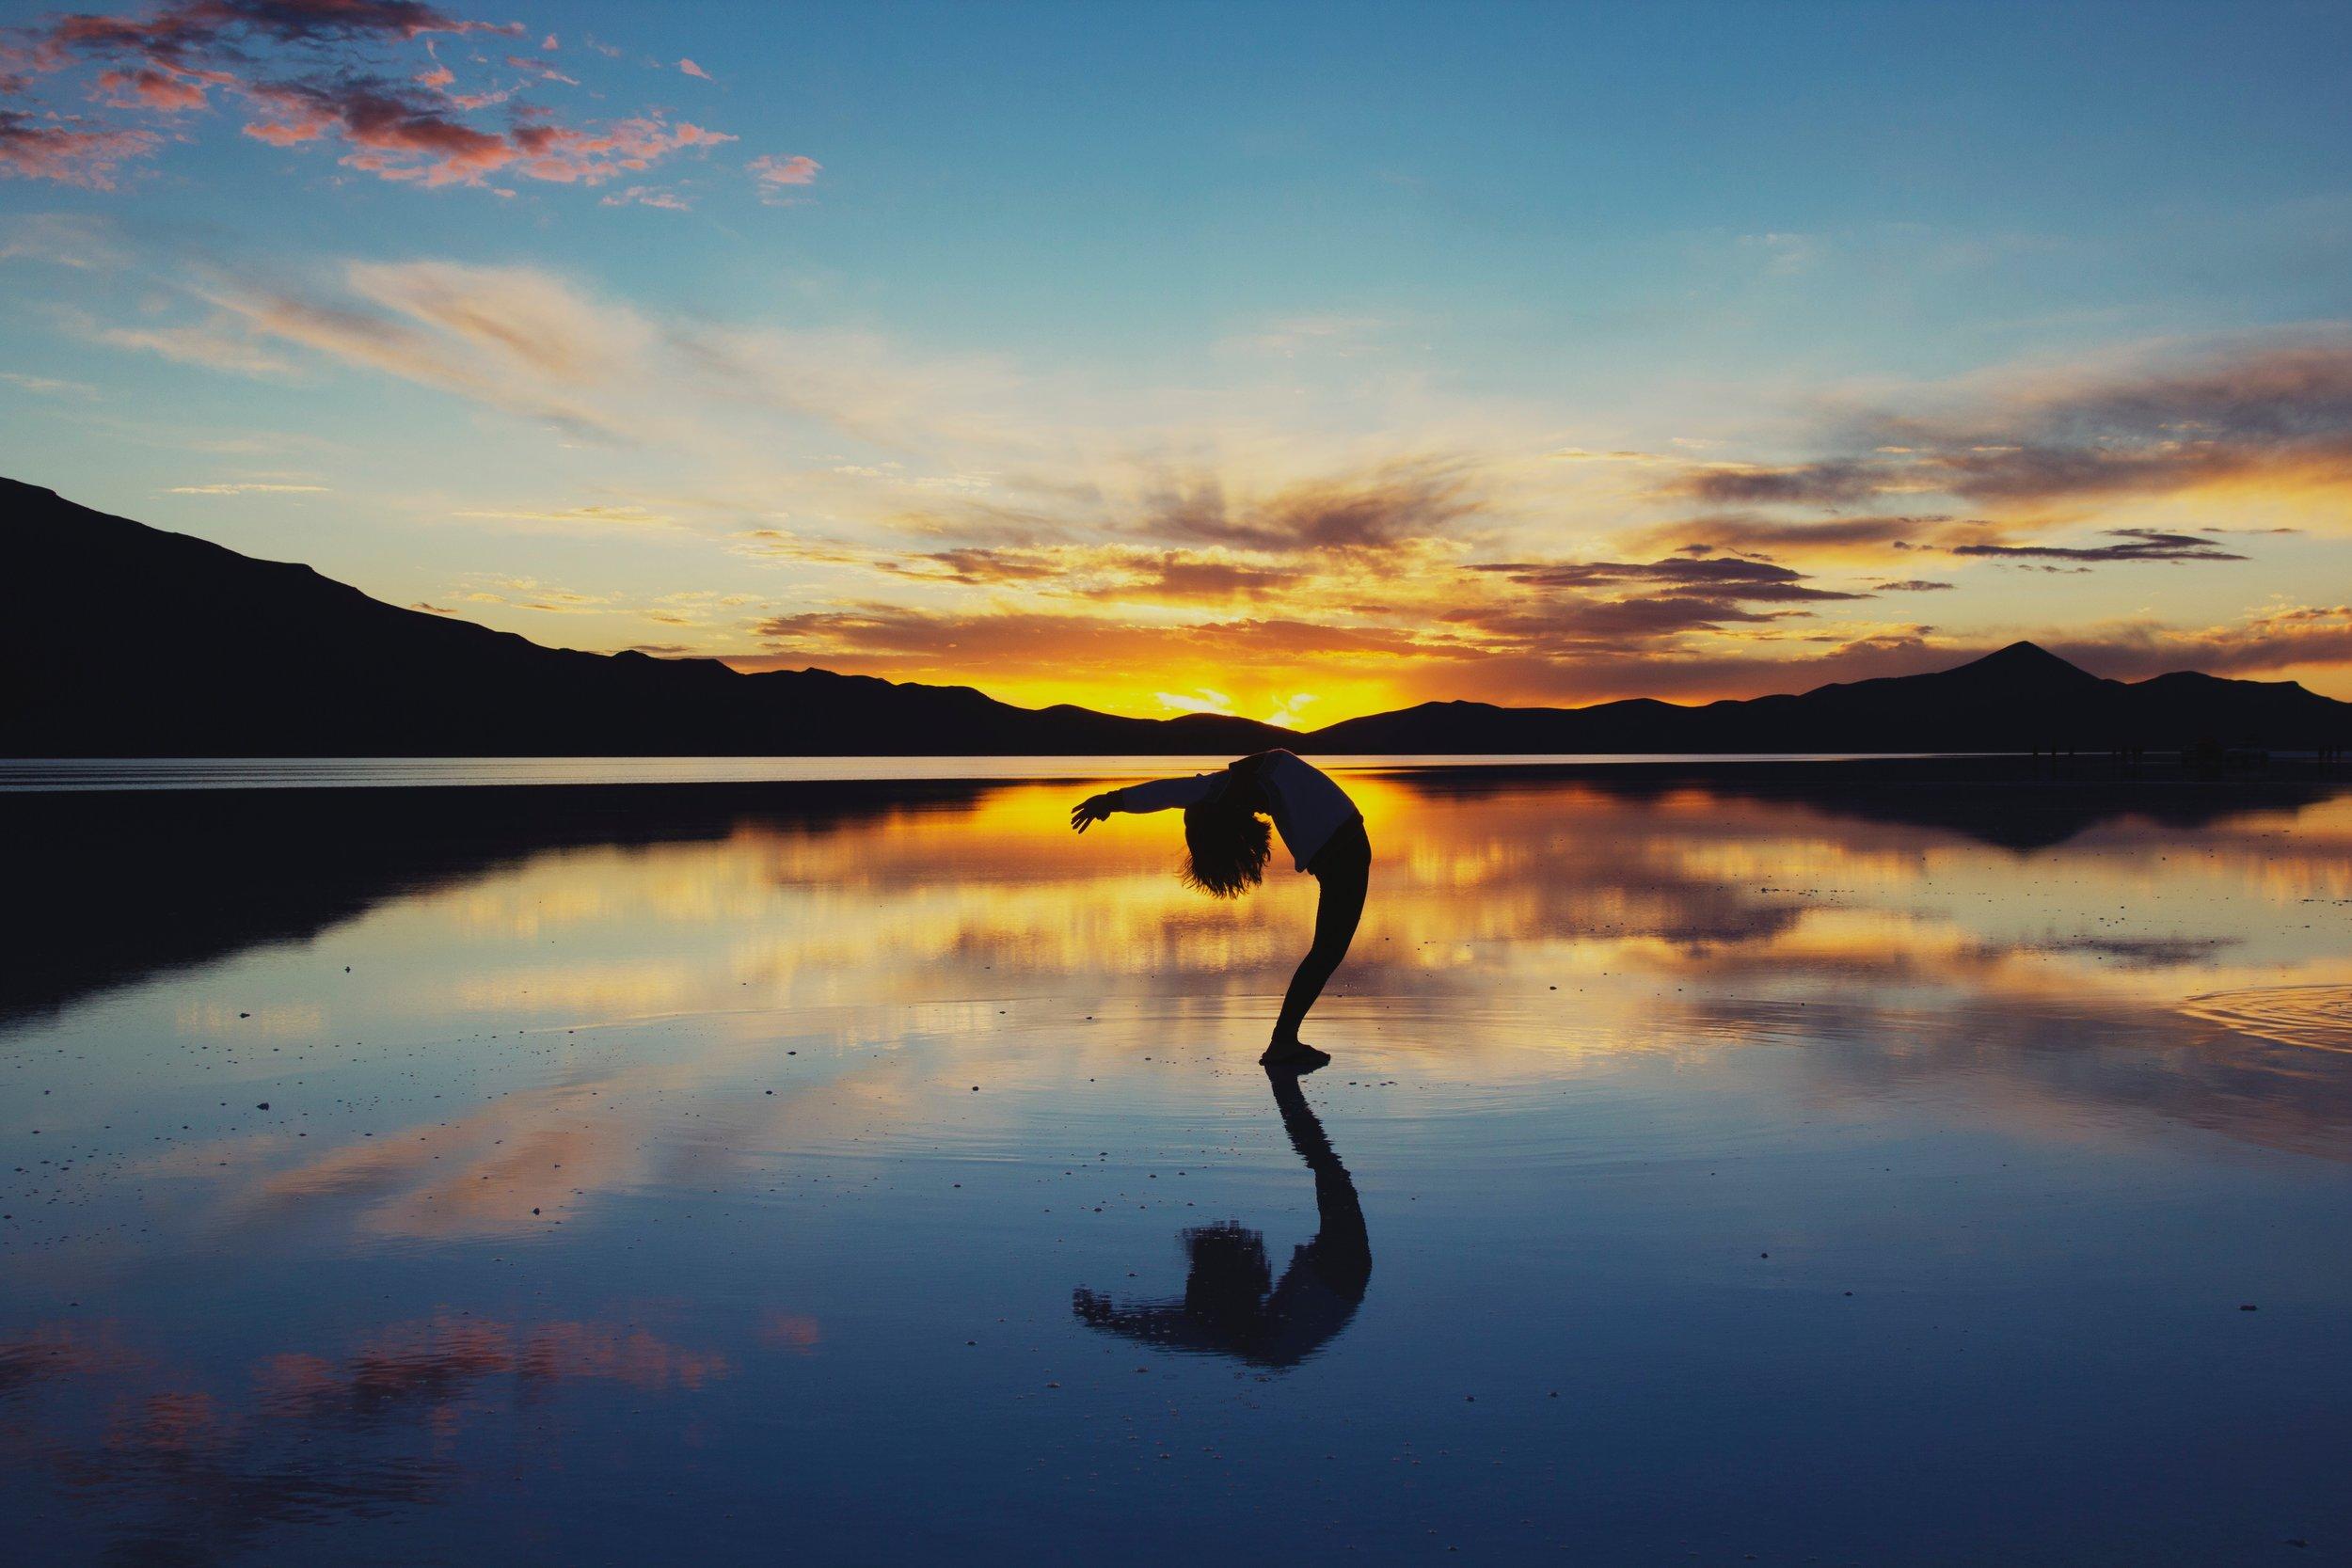 yoga-farsai-c-232290-unsplash.jpg